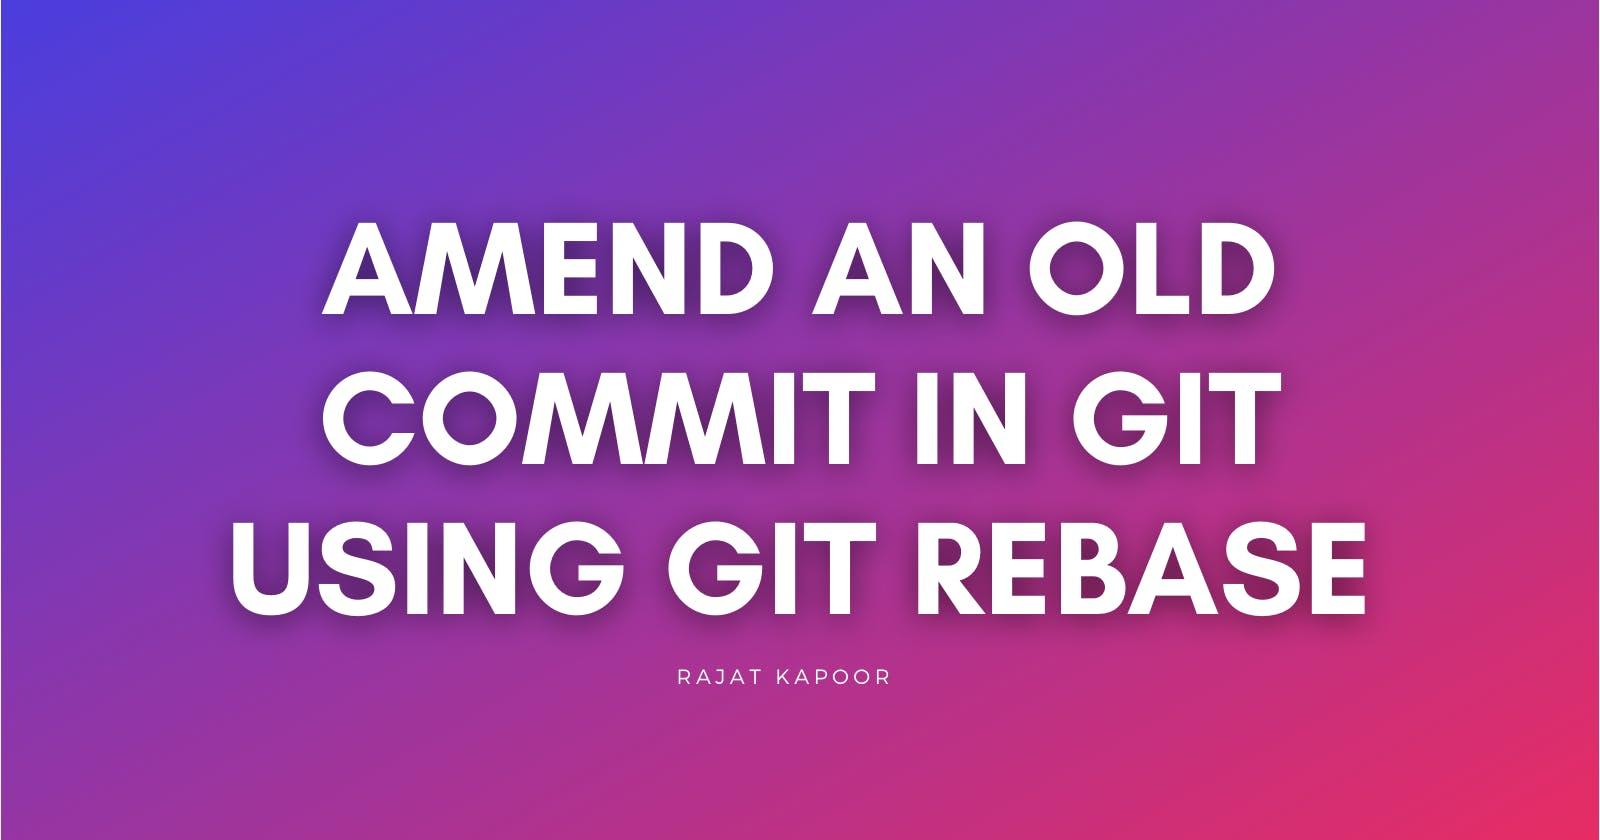 Amend an old git commit using git rebase